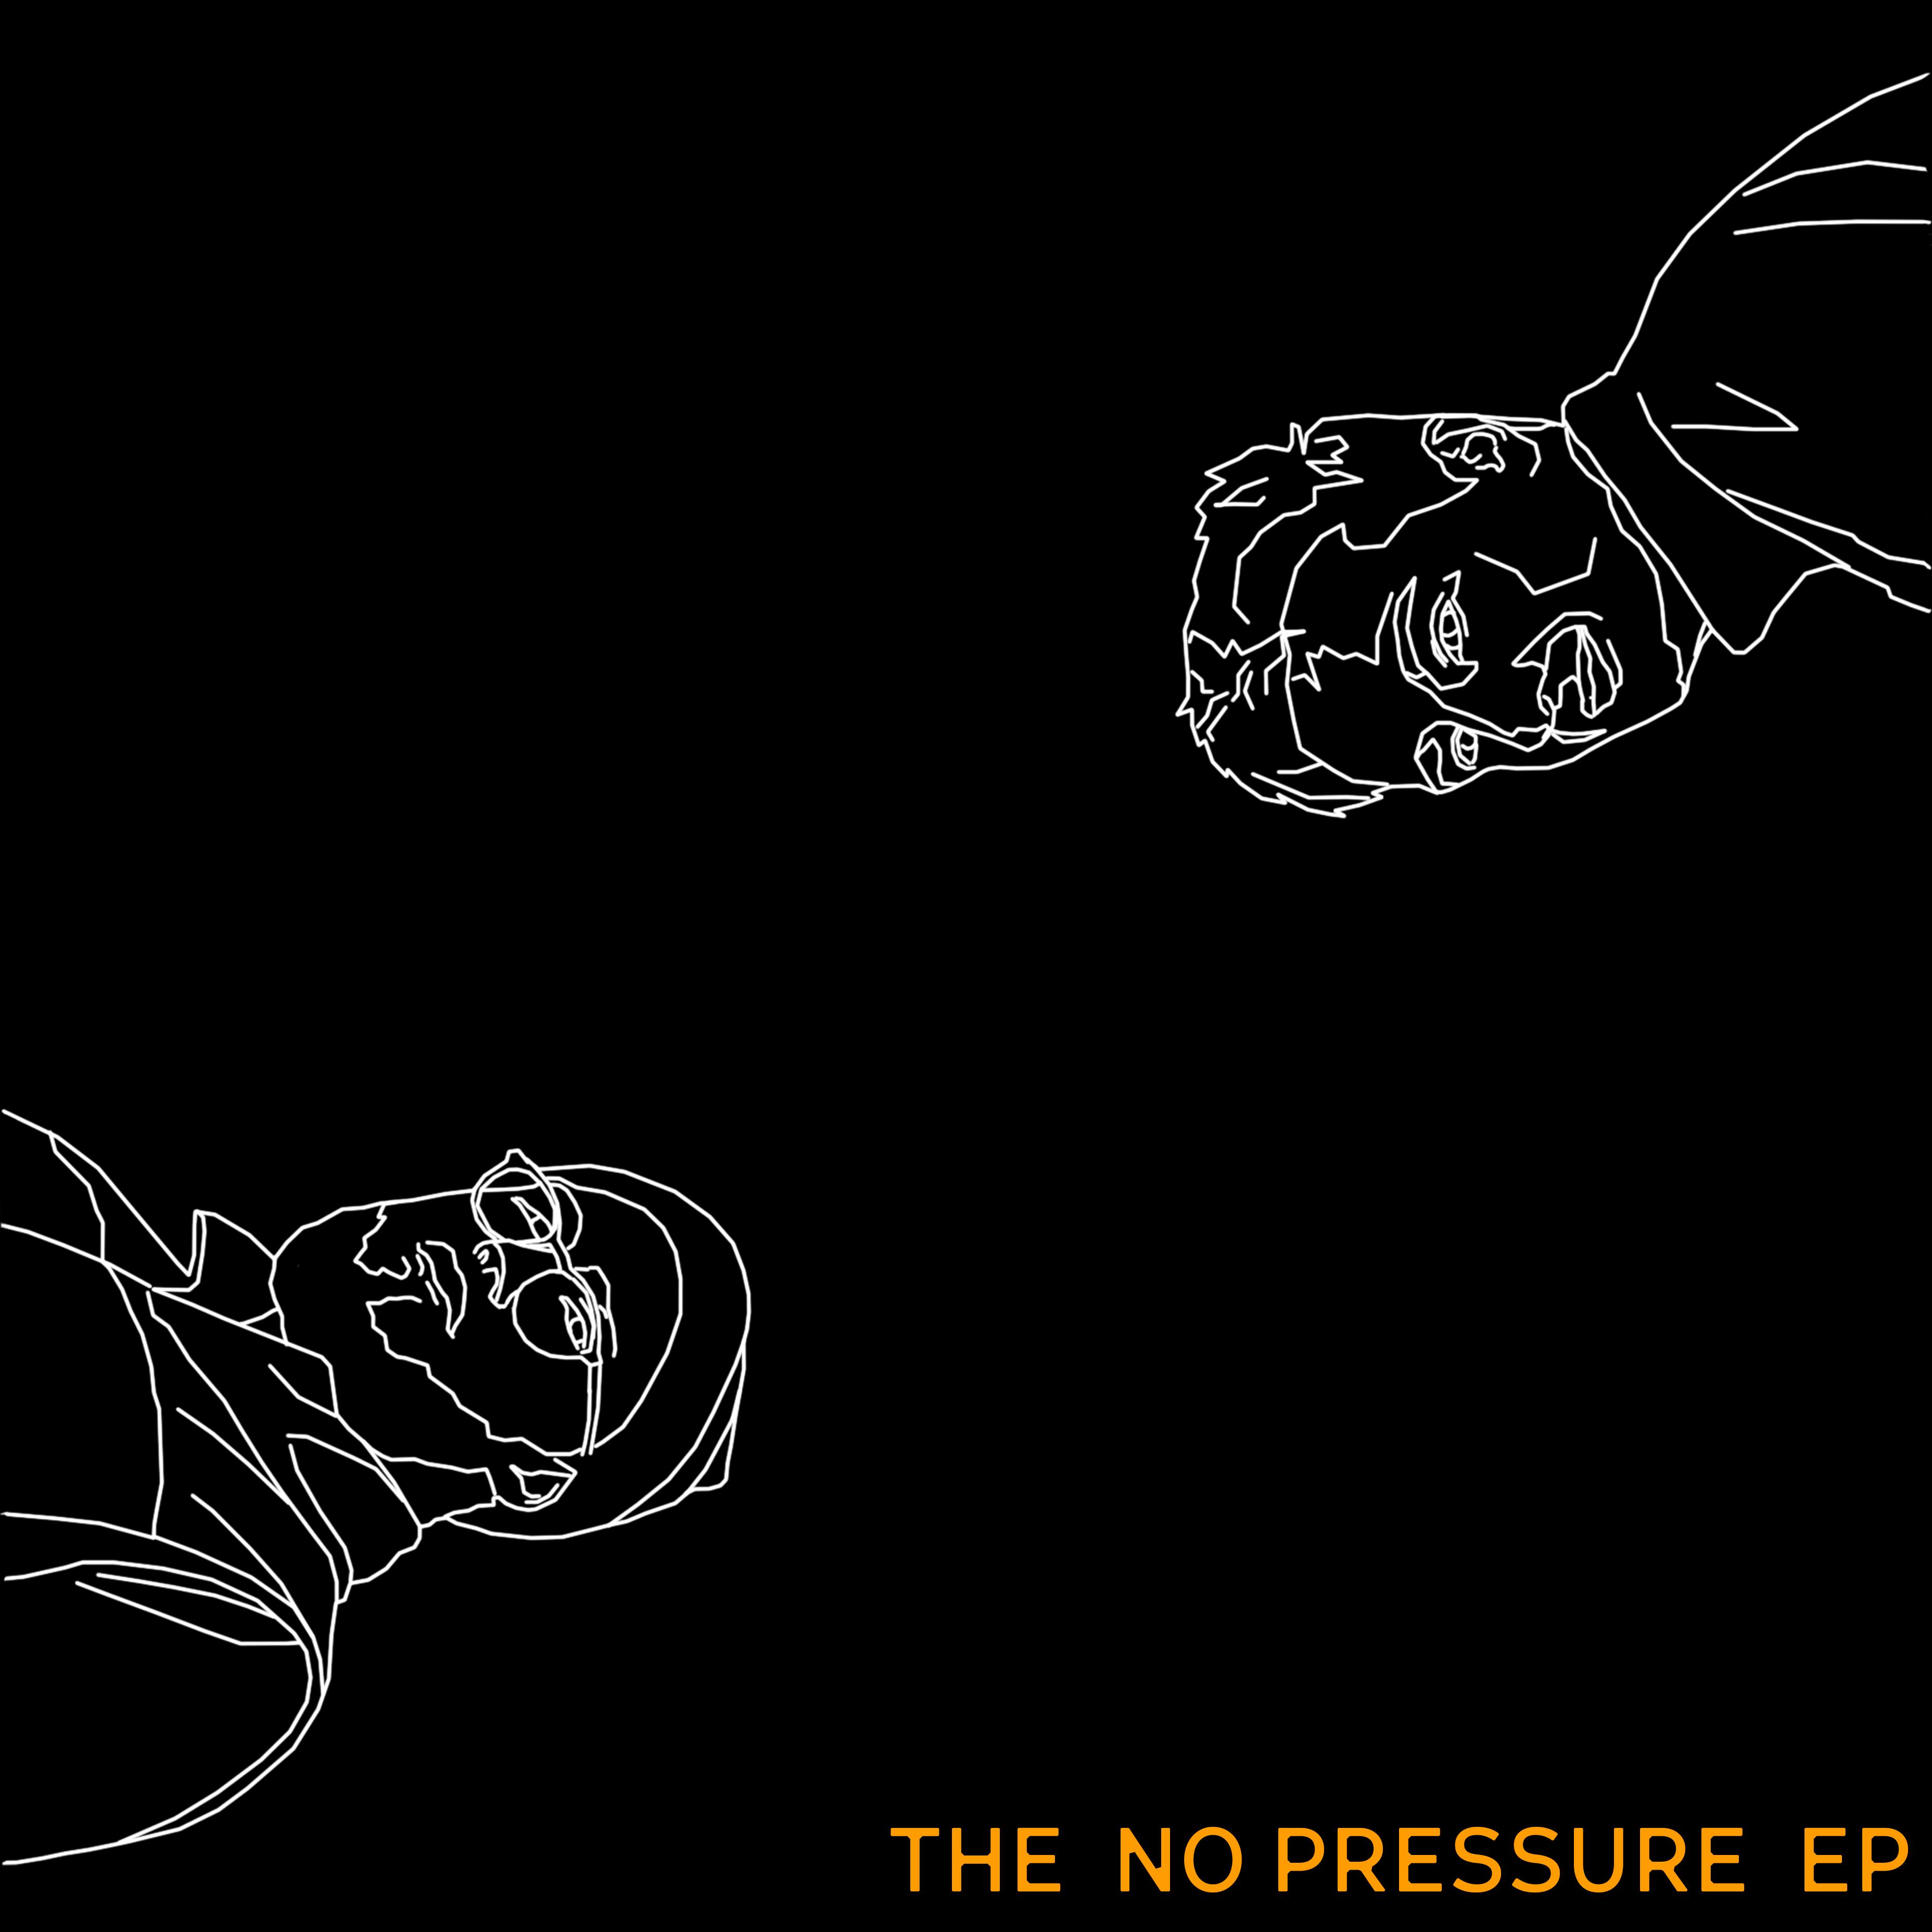 The No Pressure EP (Click to listen)